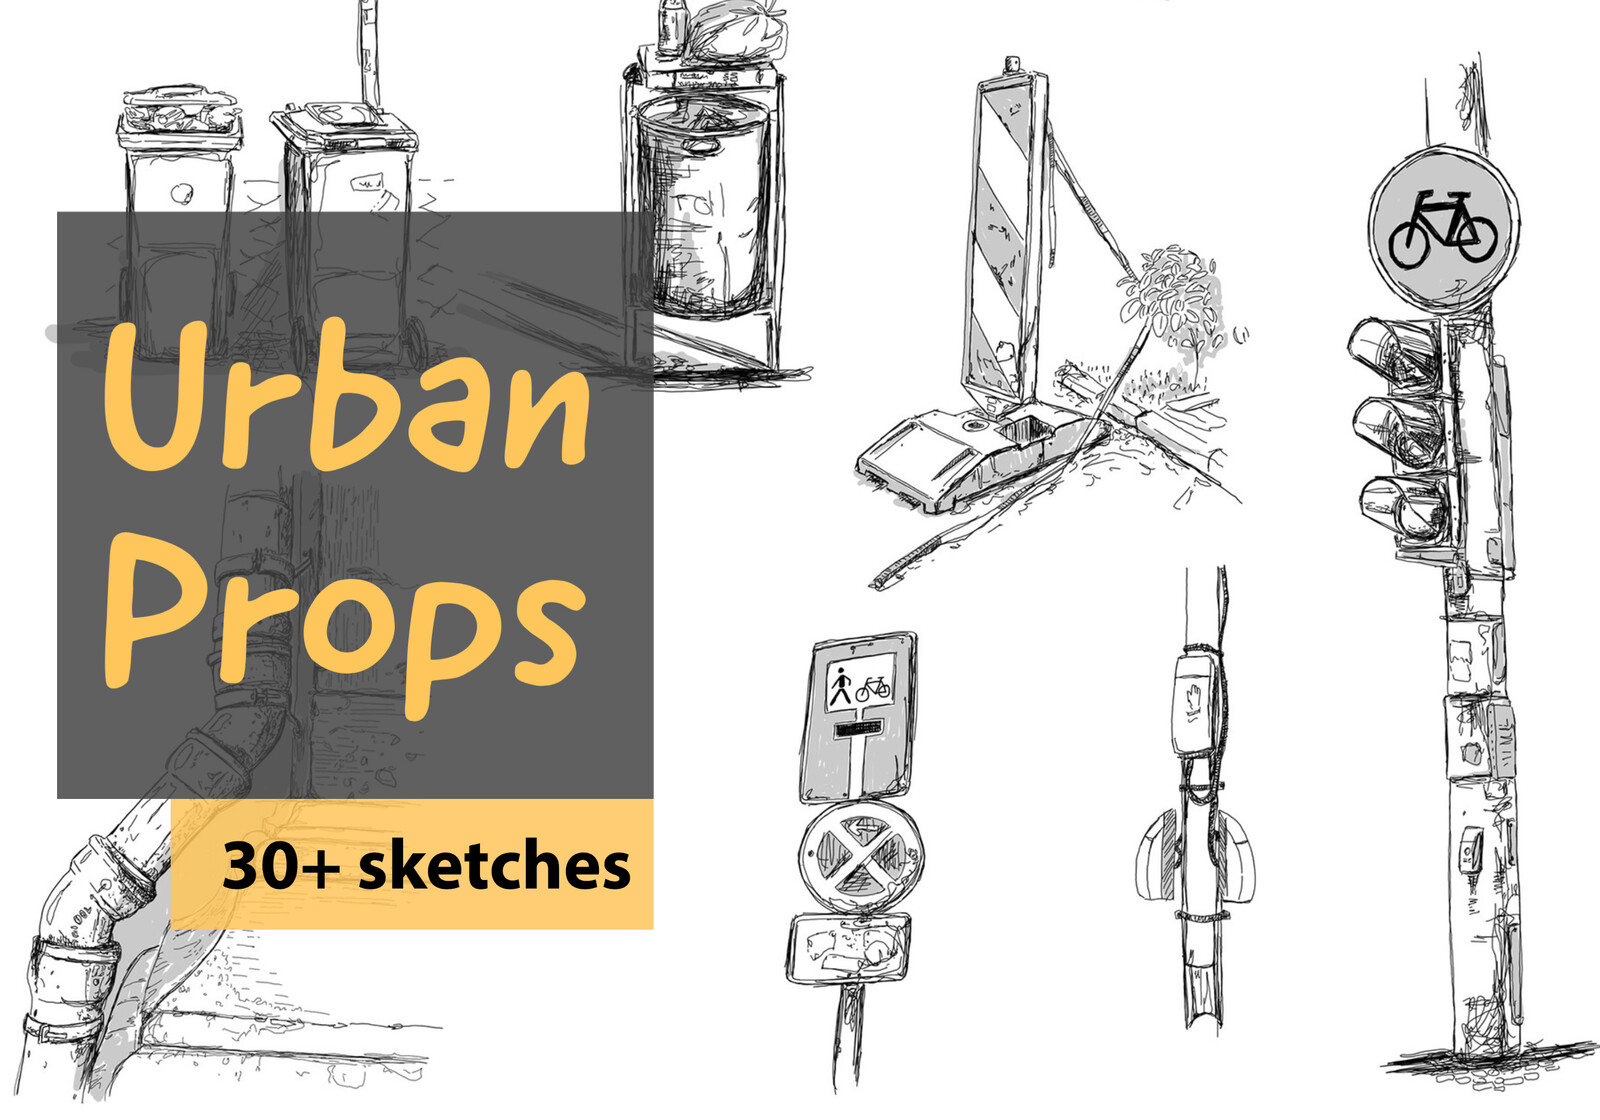 Urban Props, 30+ sketches